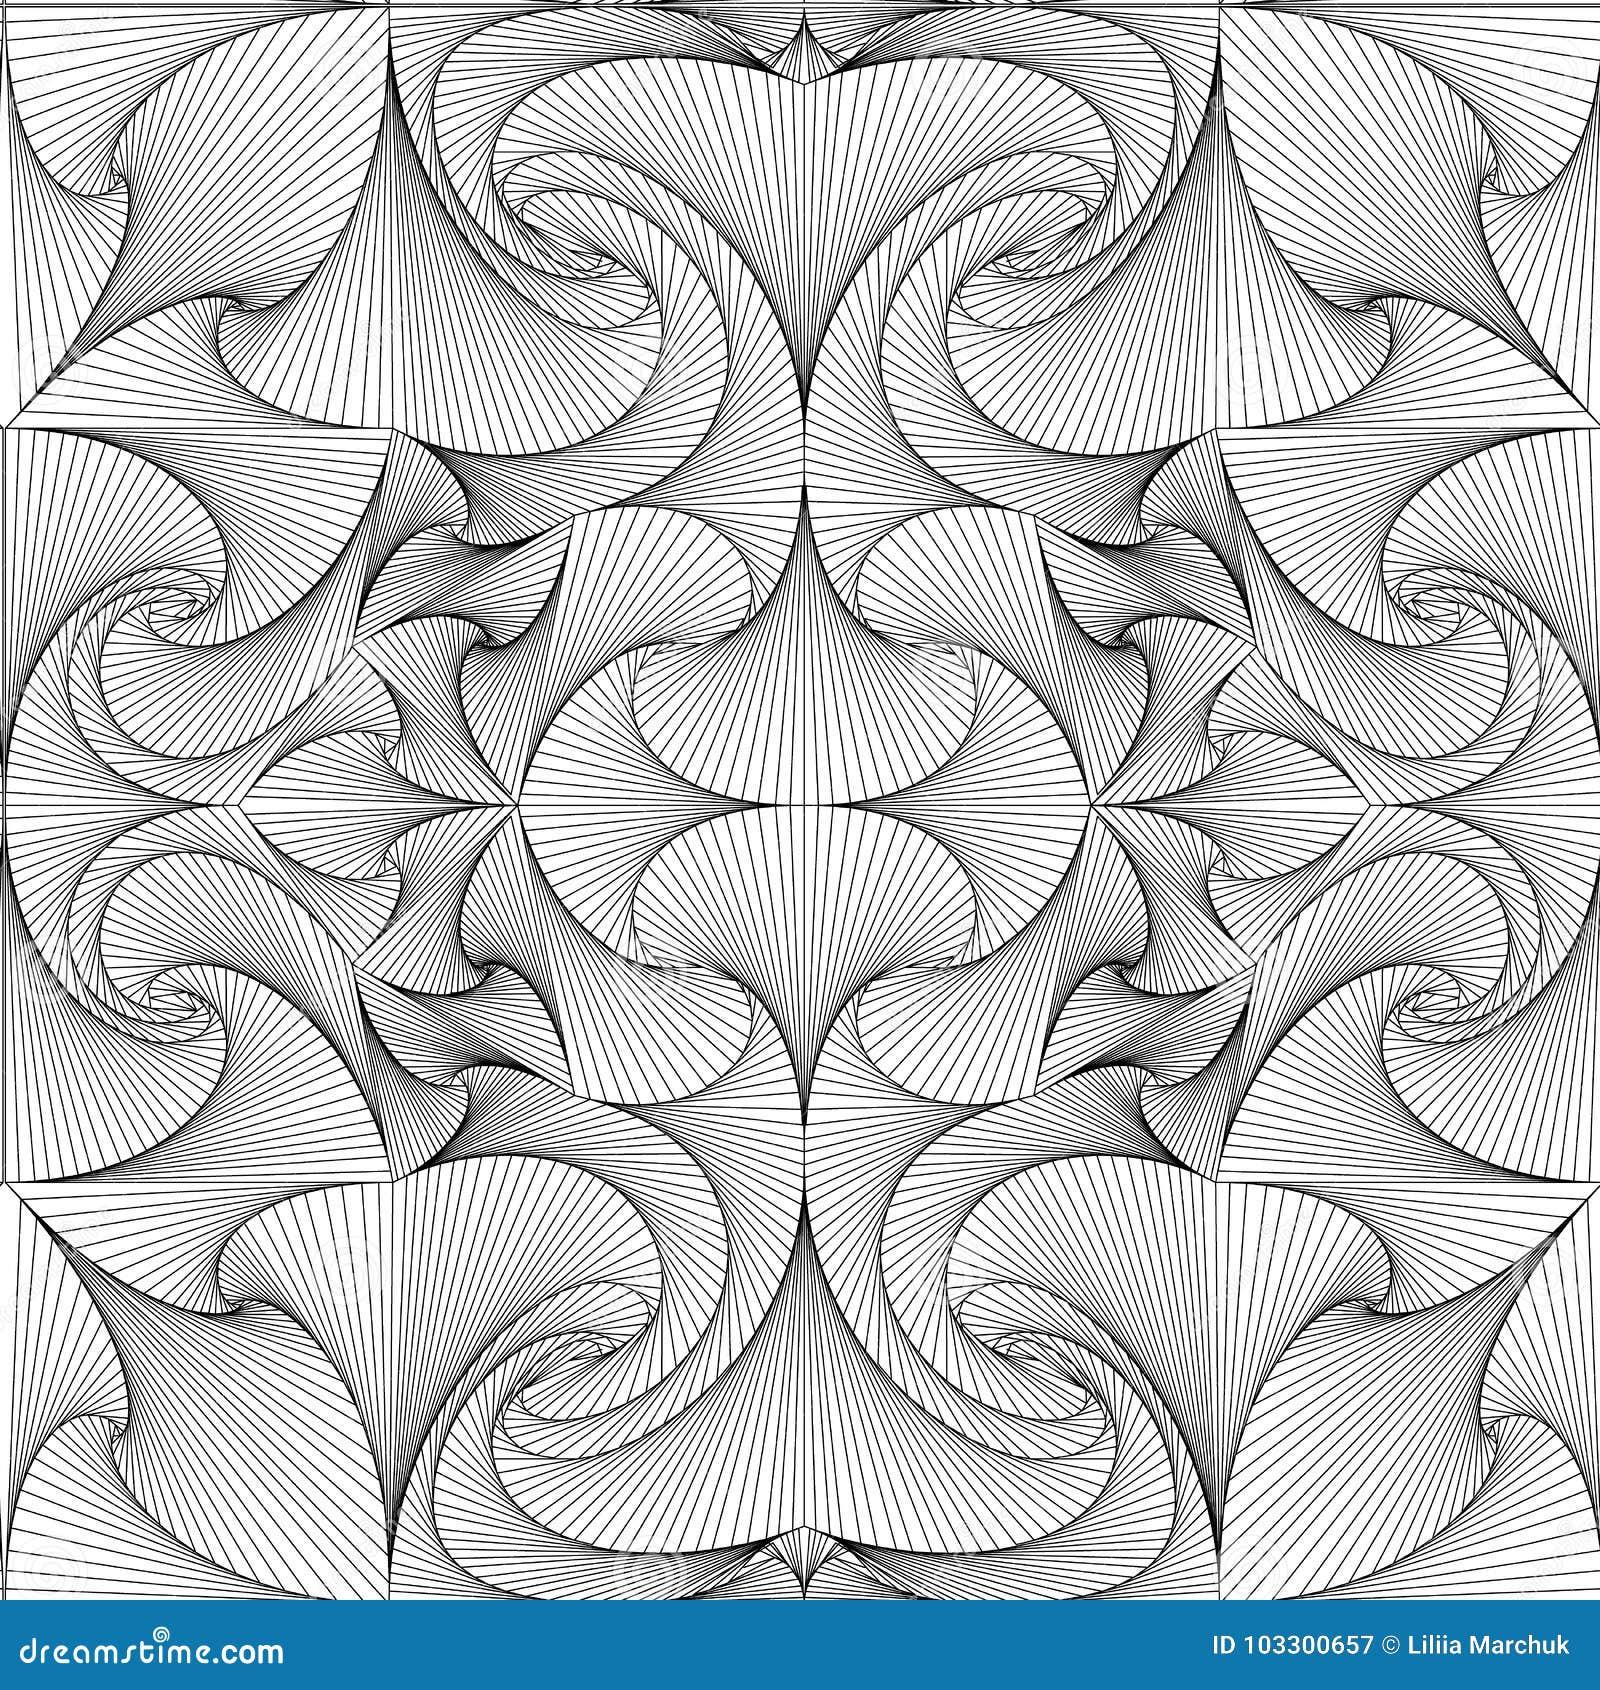 Download Vector Illustration Of A Paradoxical Paradox Stock